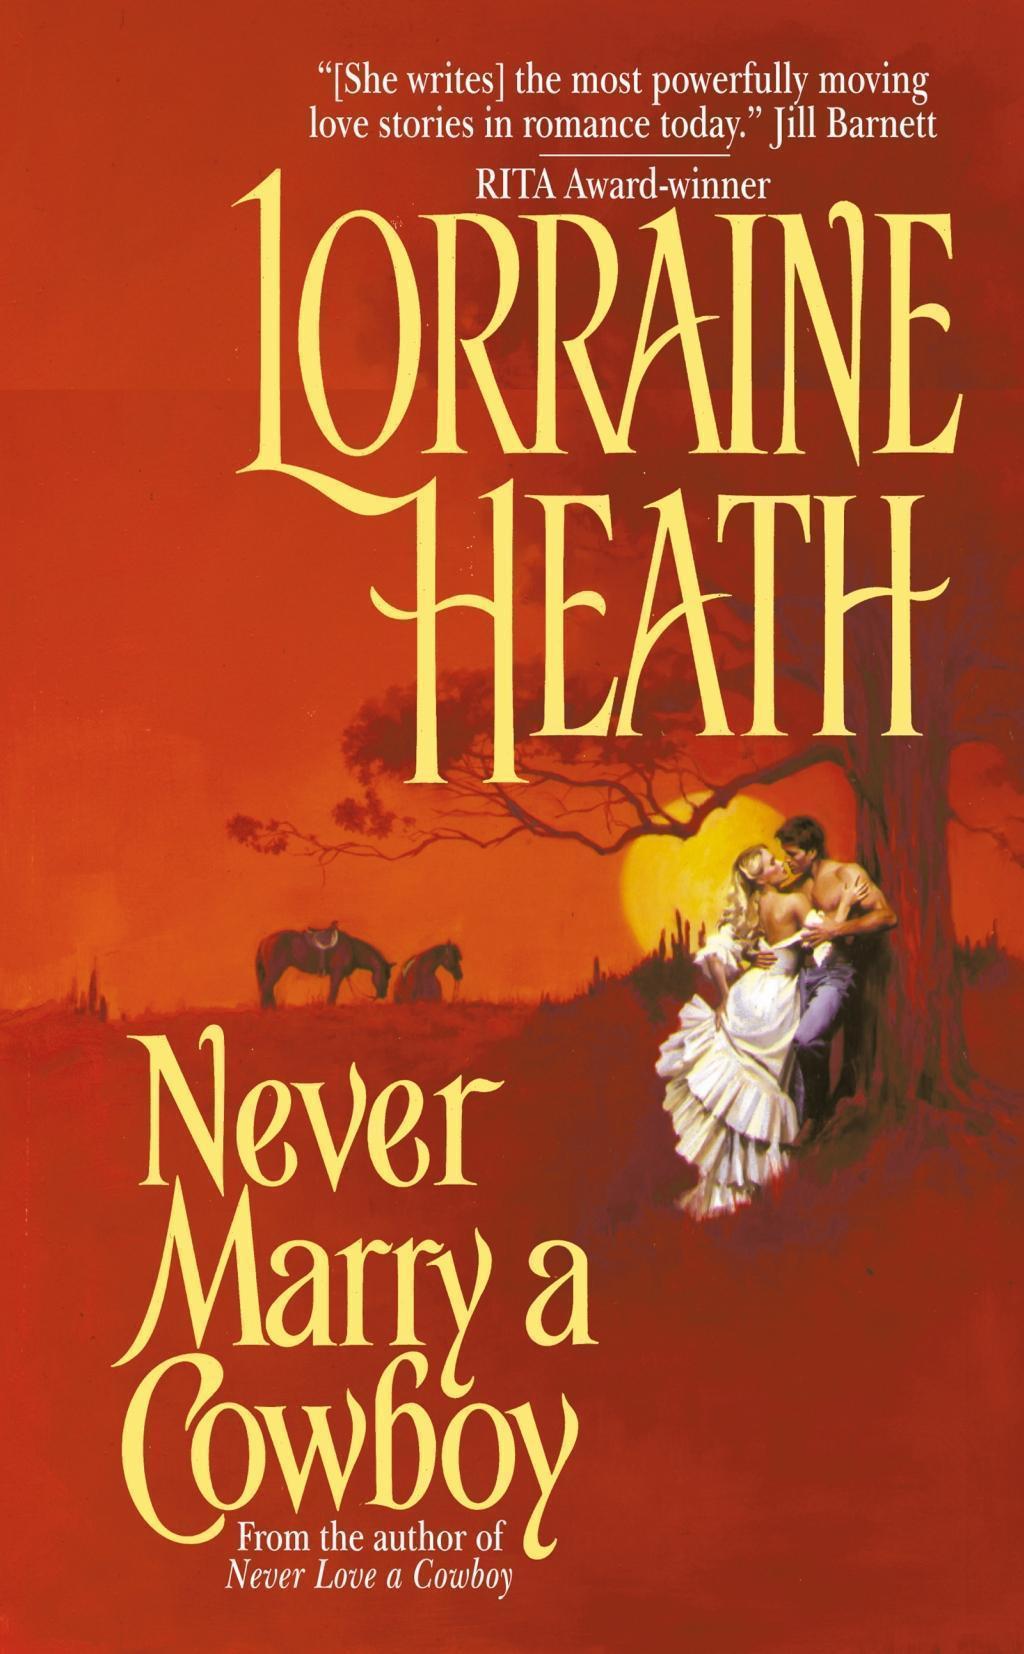 Never Marry a Cowboy